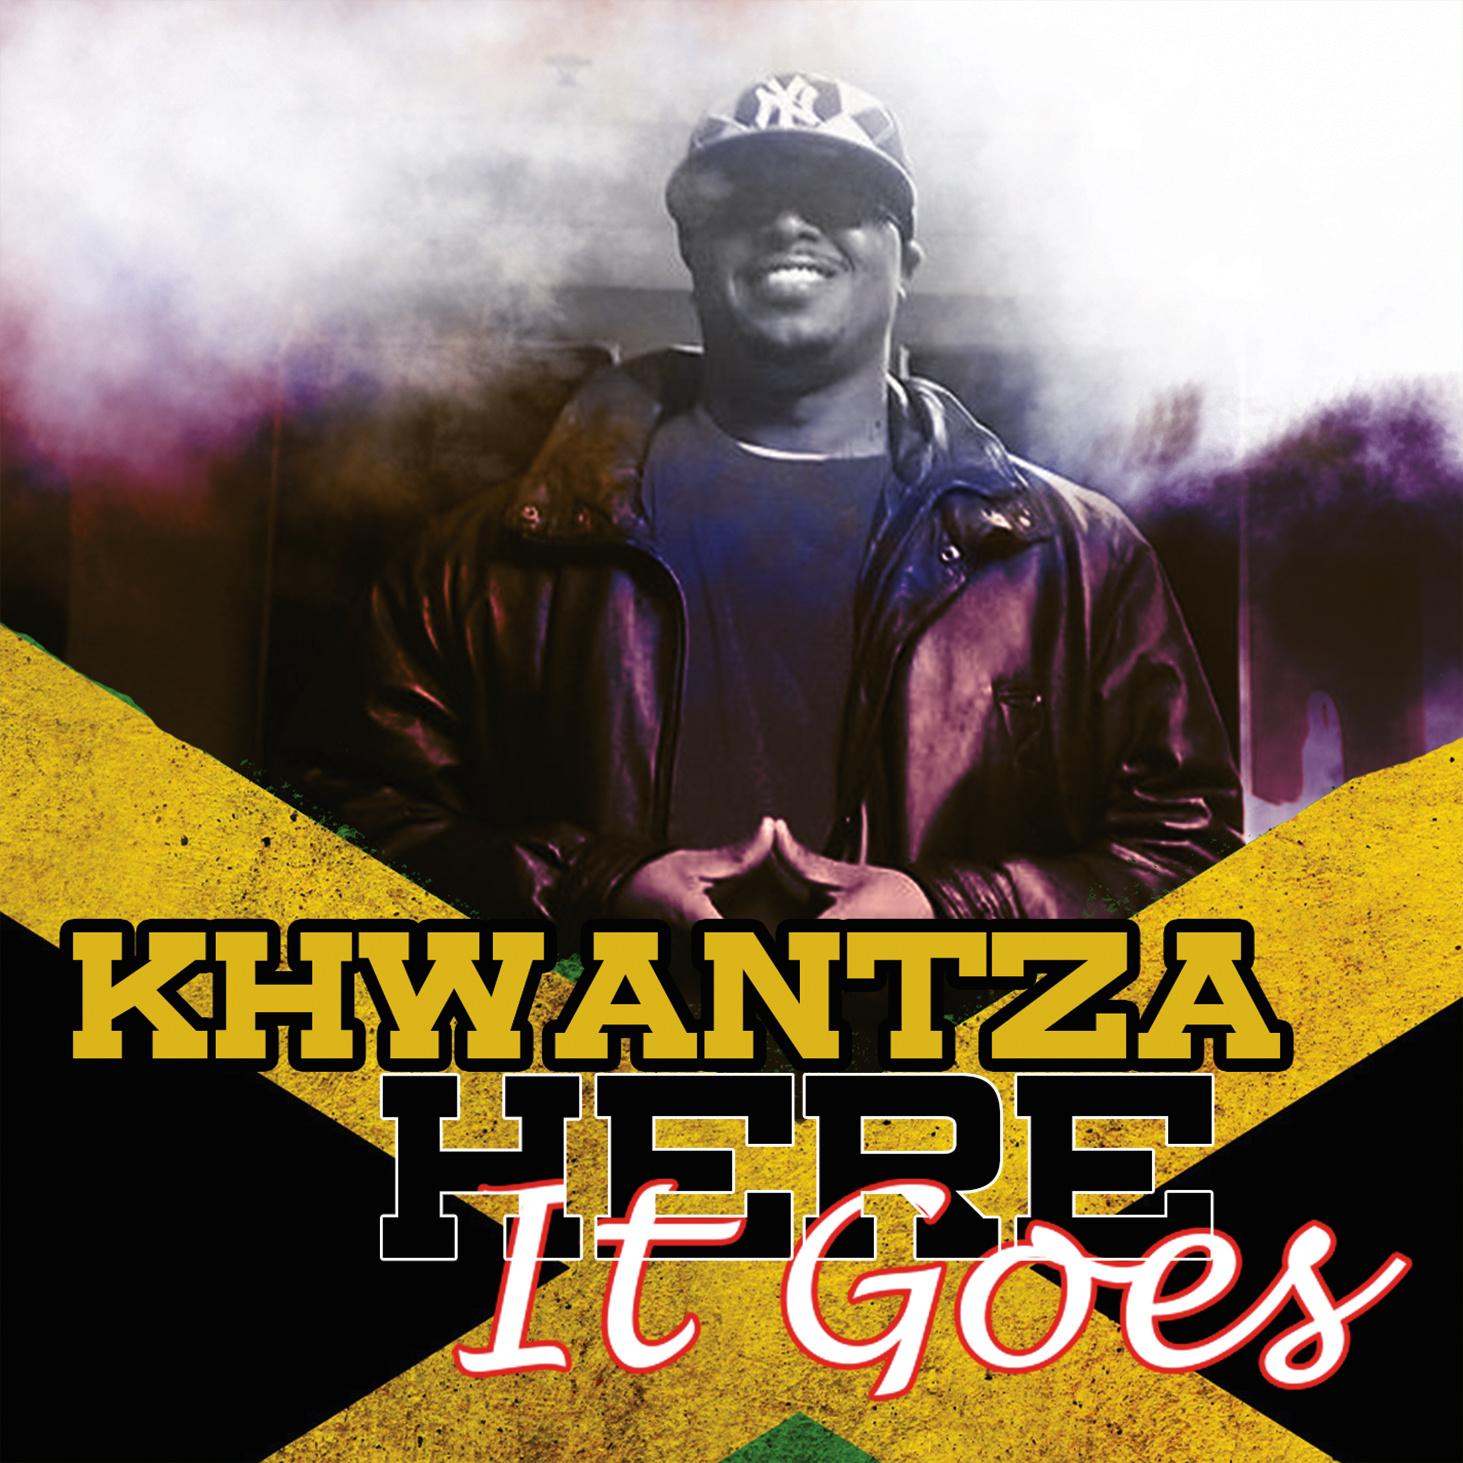 khwantza CD Cover